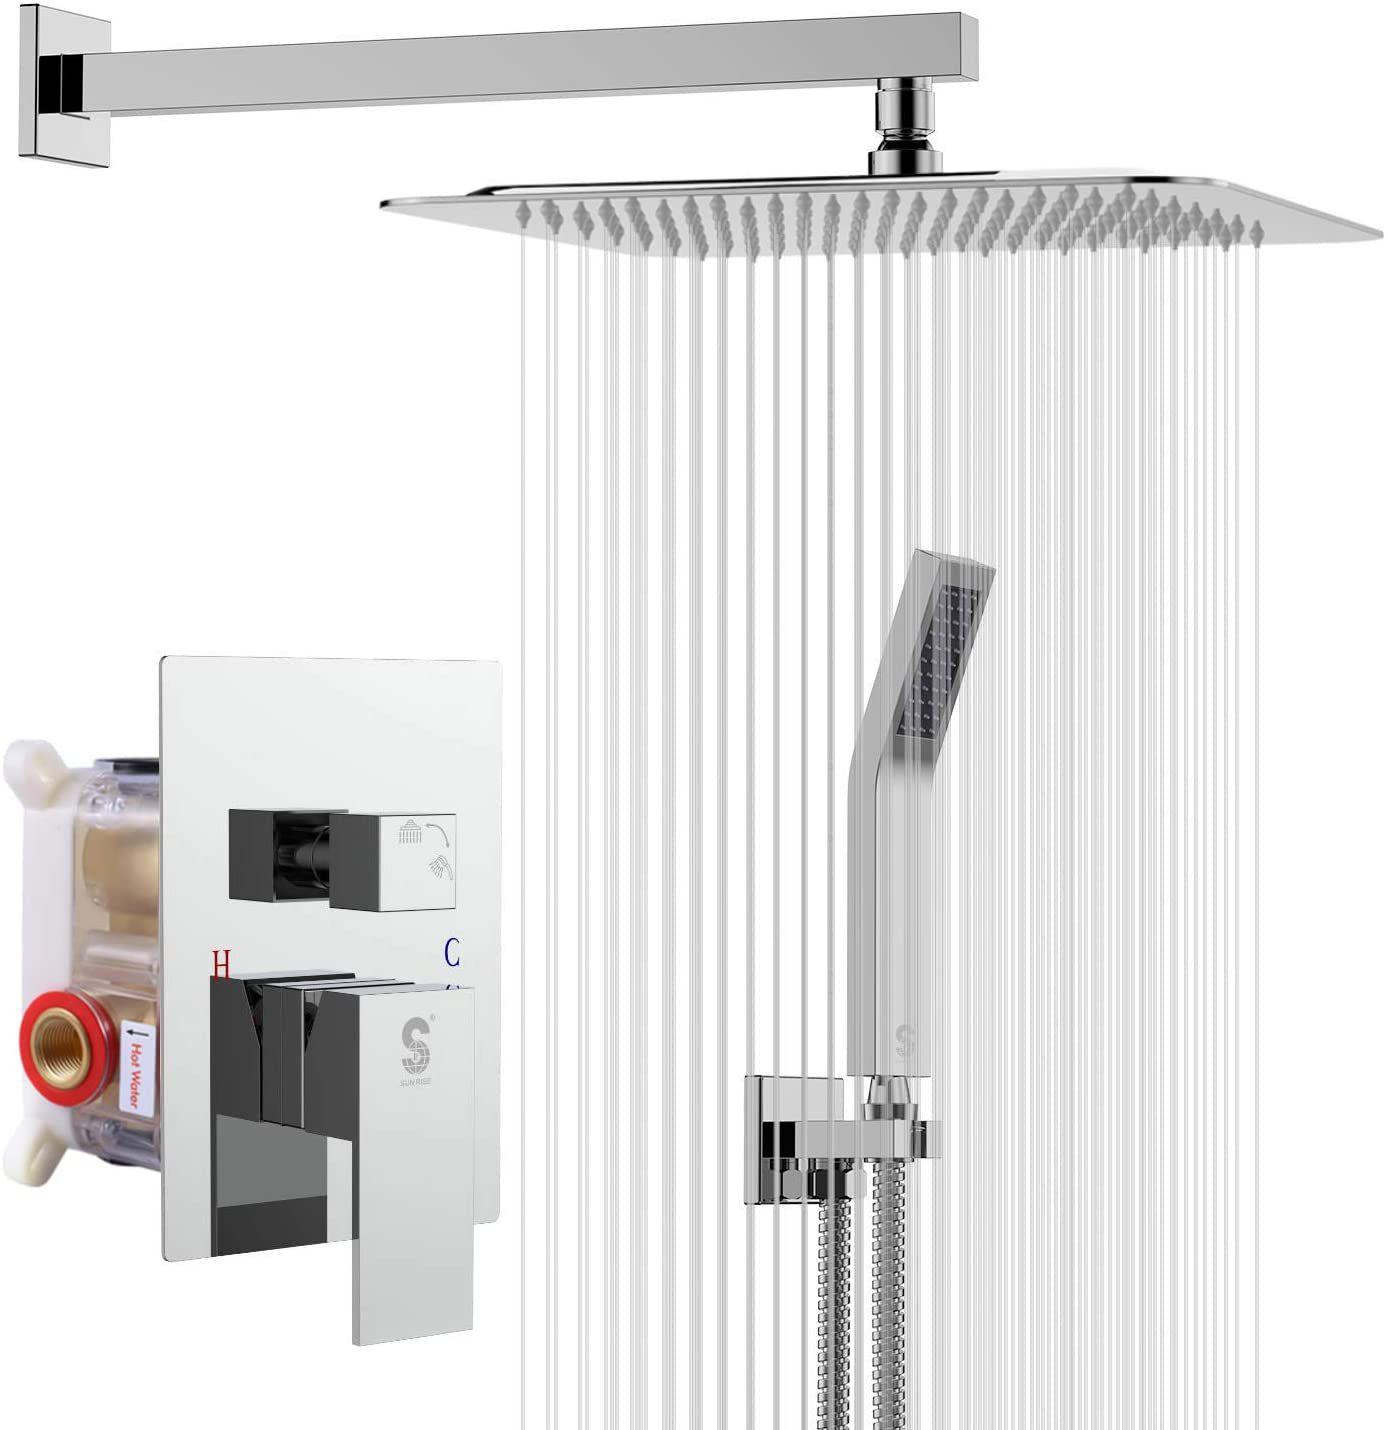 SR SUN RISE 10 Inches Bathroom Luxury Rain Mixer Shower Combo Set